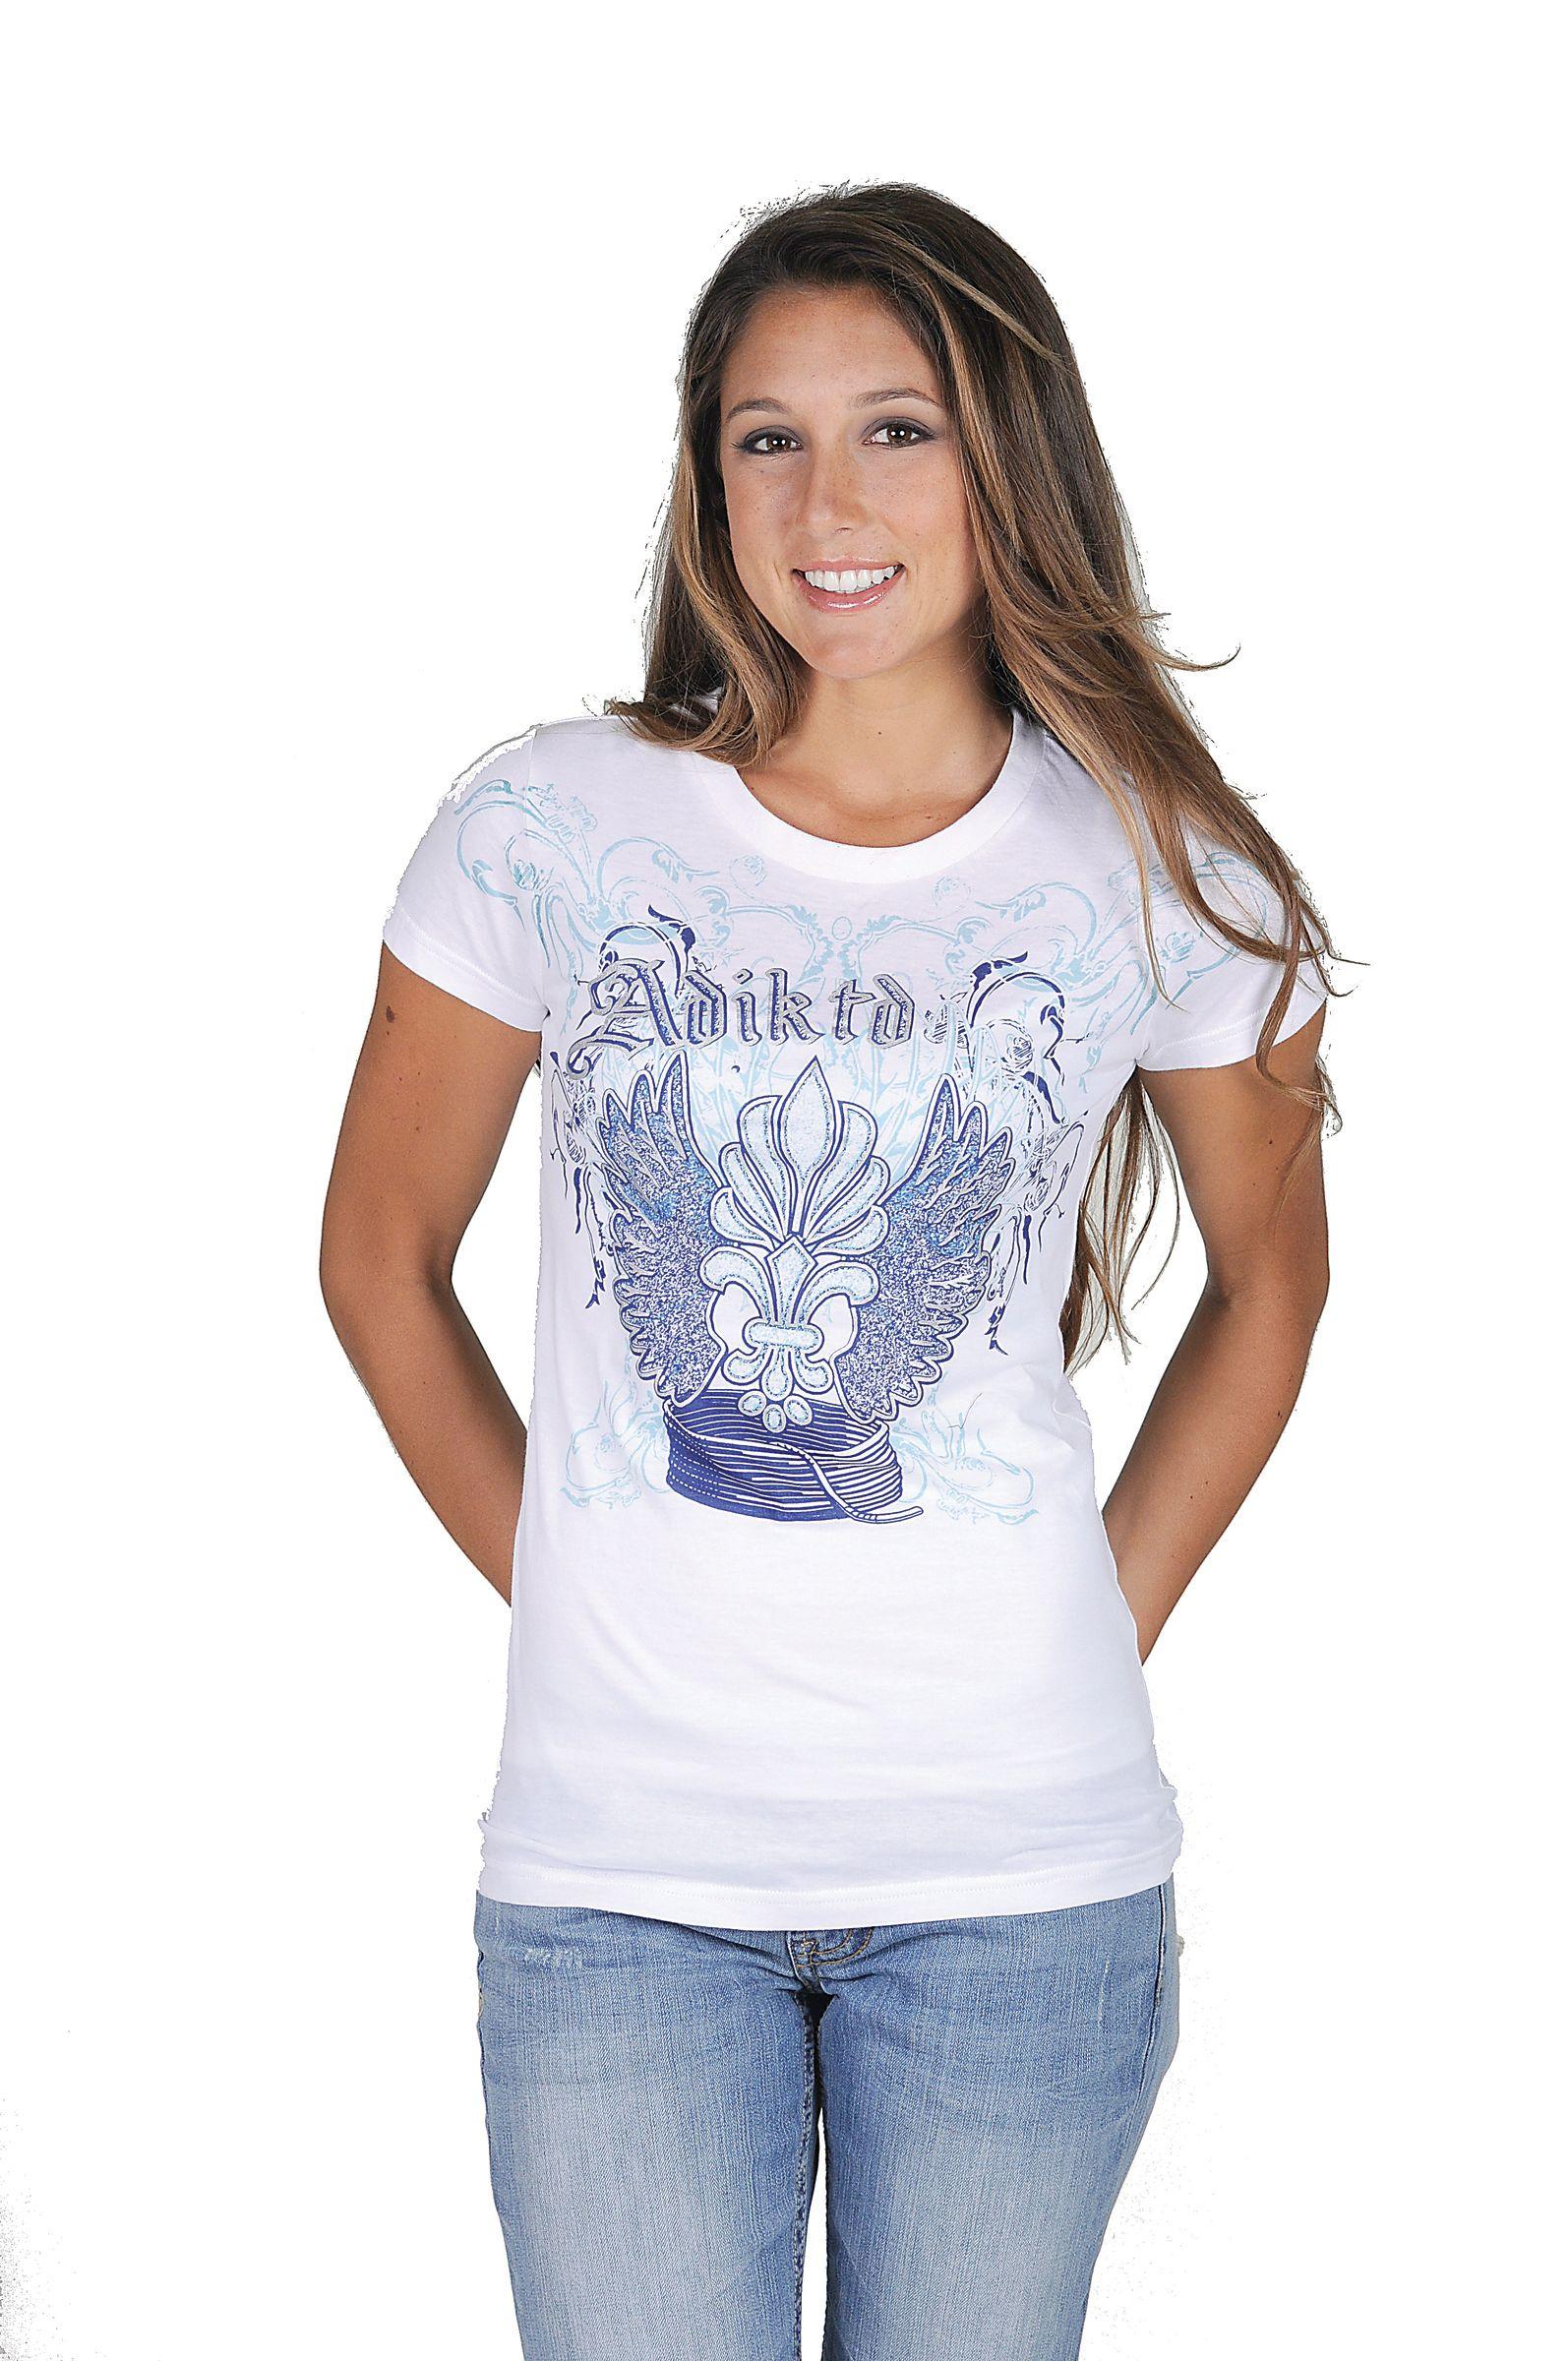 Adiktd Ladies Cotton Jersey Tee Shirt